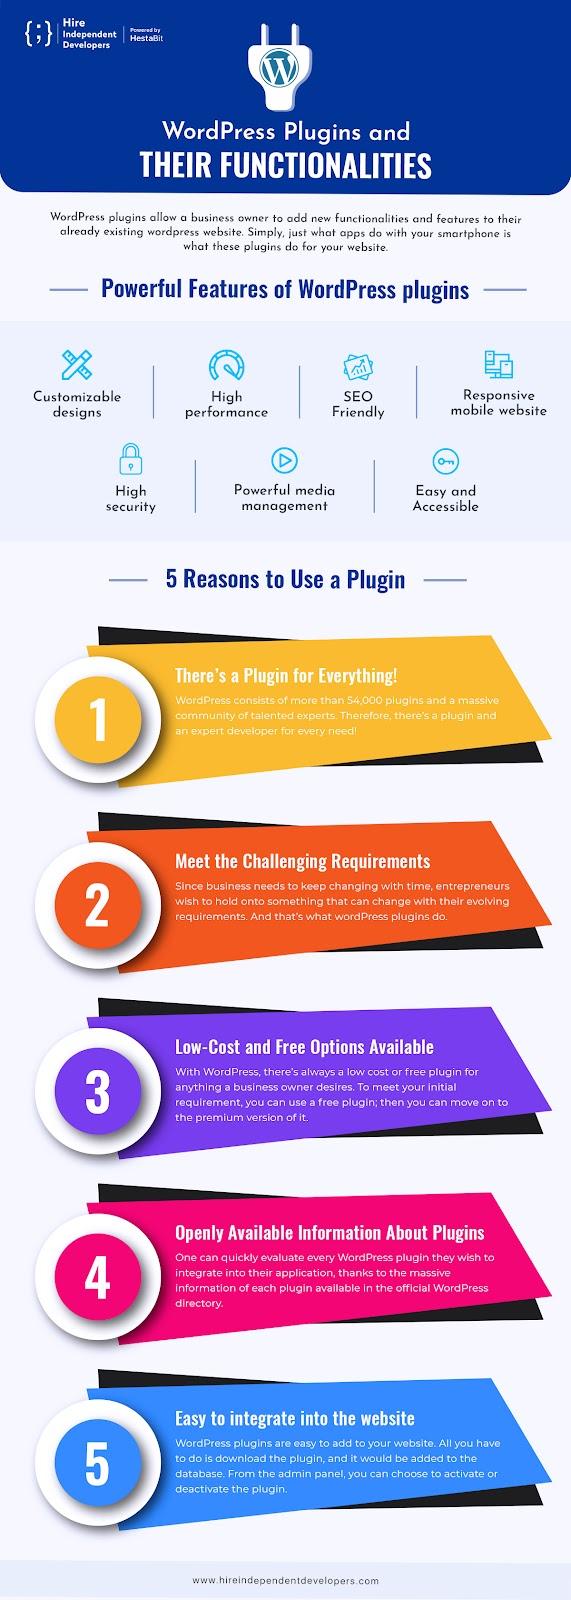 Best WordPress Plugins Features